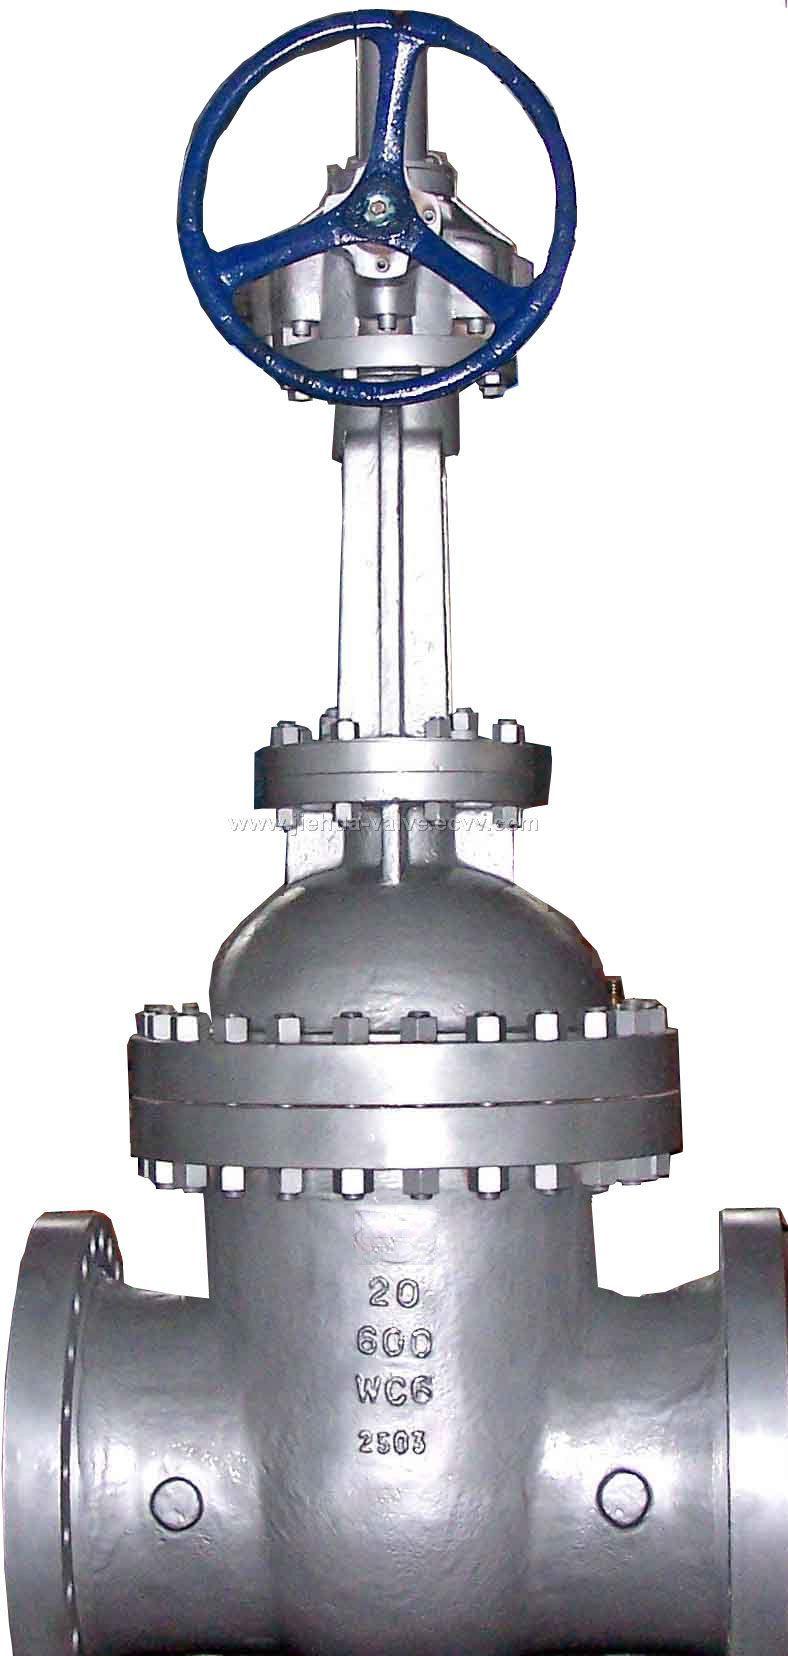 Astm a216 wcc flanged RF RTJ gate valve class 150 300 600